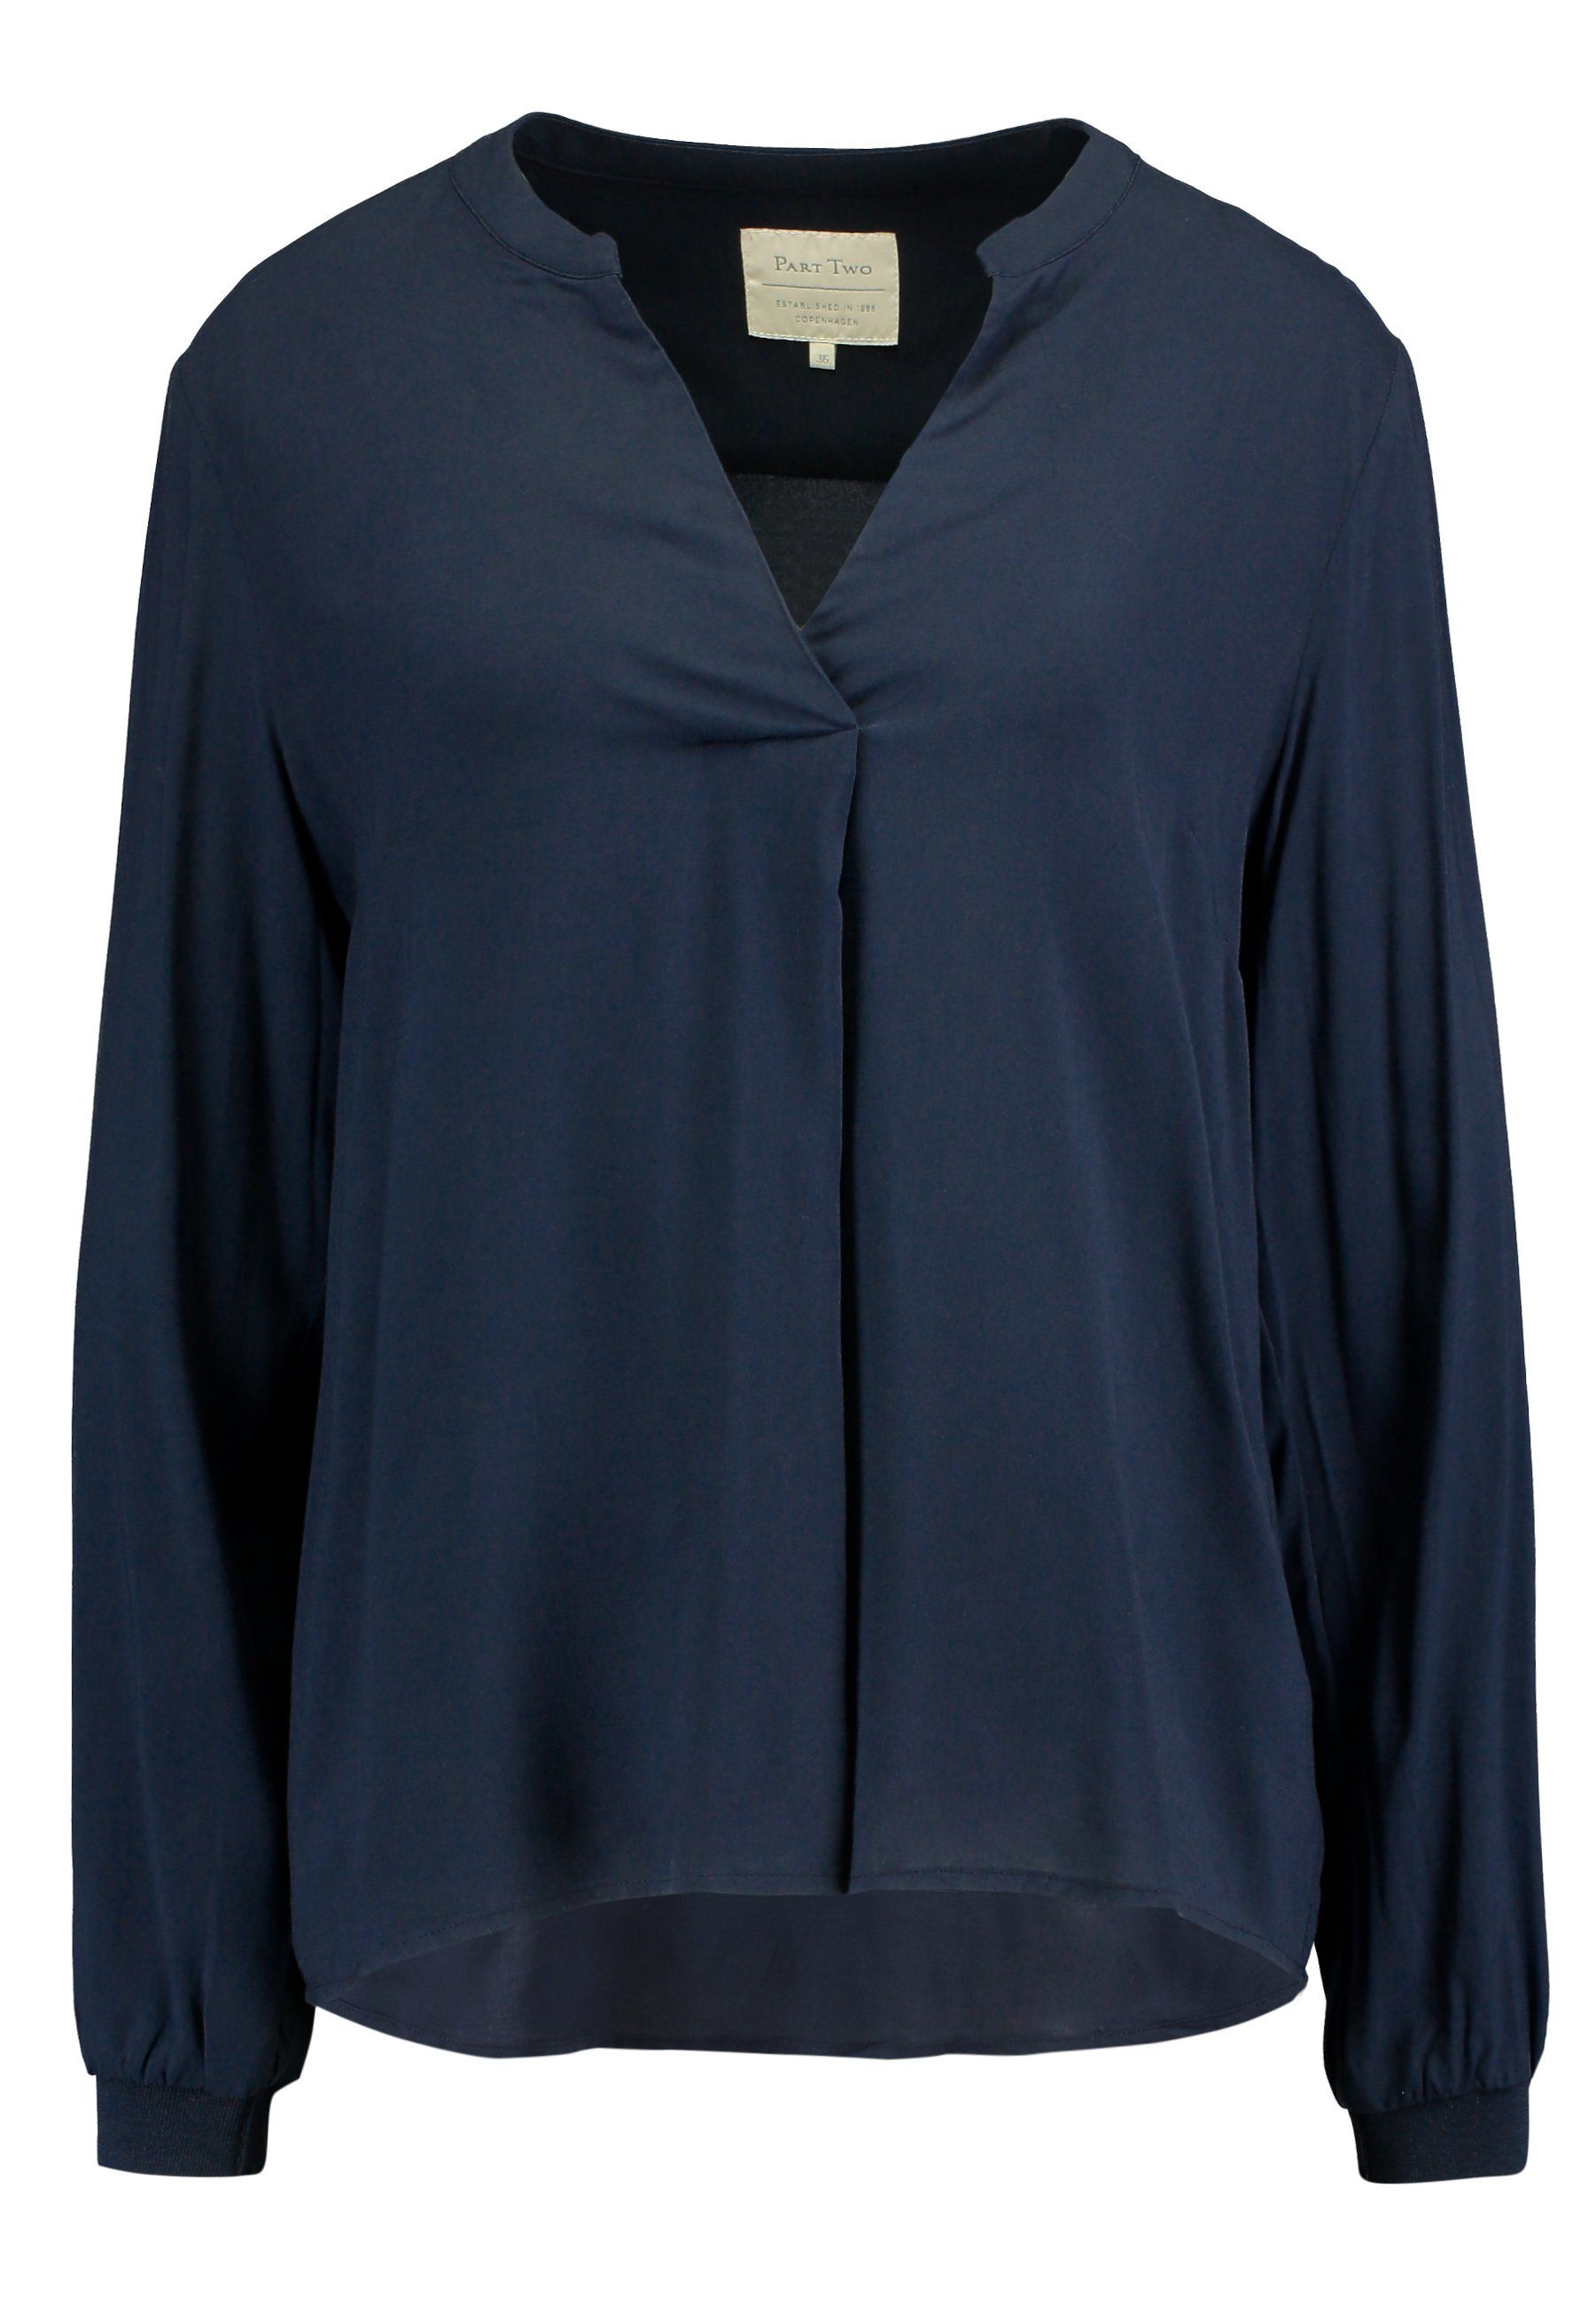 Black NIKA blouse  Part Two  Bluser - Dameklær er billig